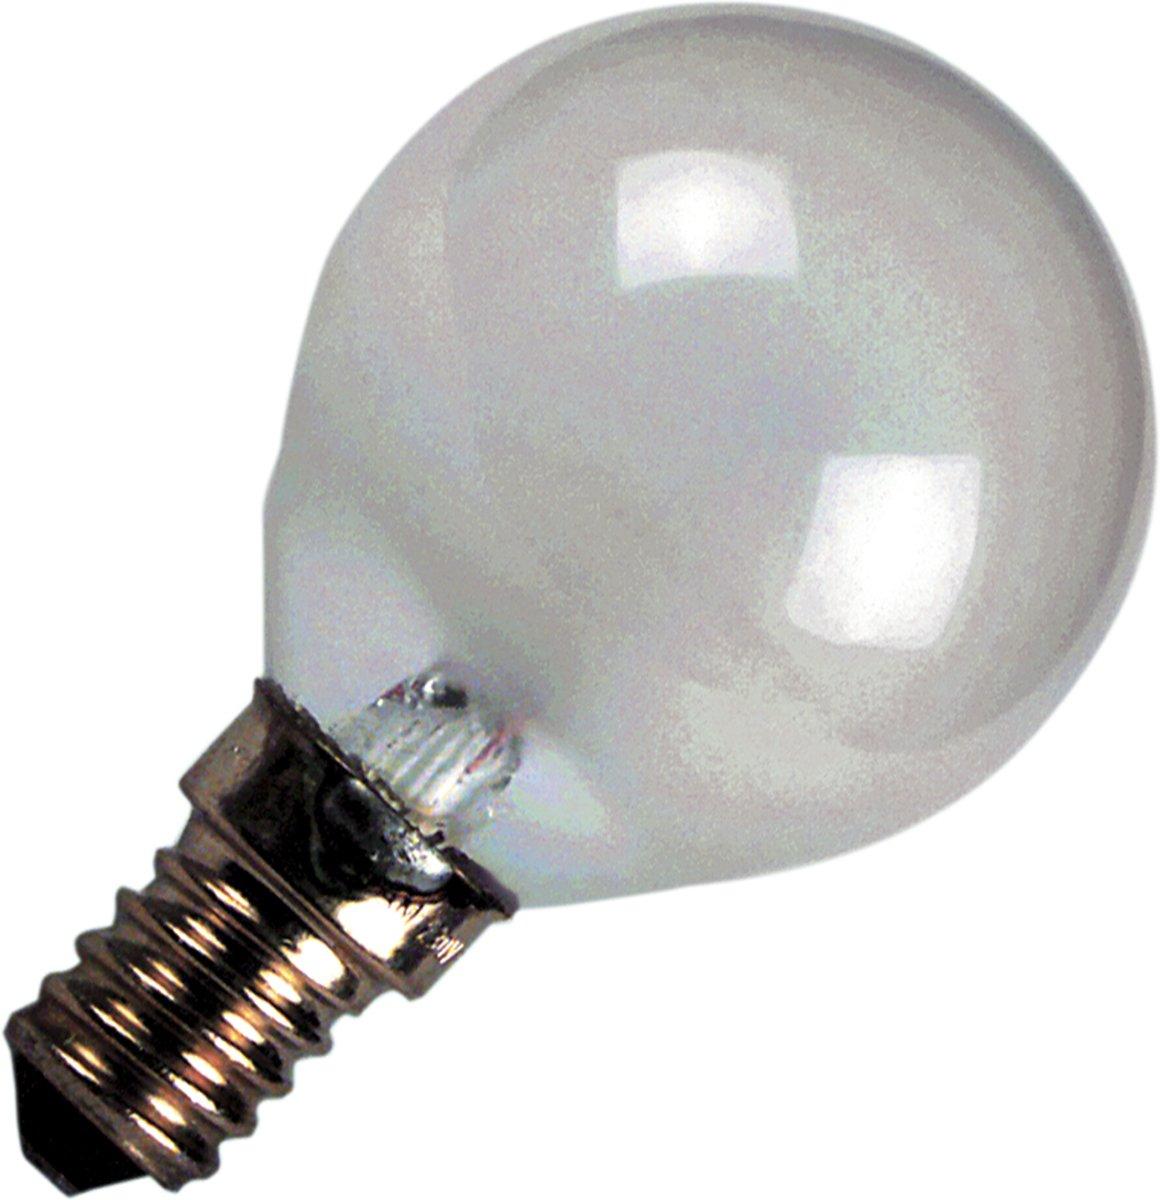 Oven Lamp E14 40 W Original Part Number 50279890003